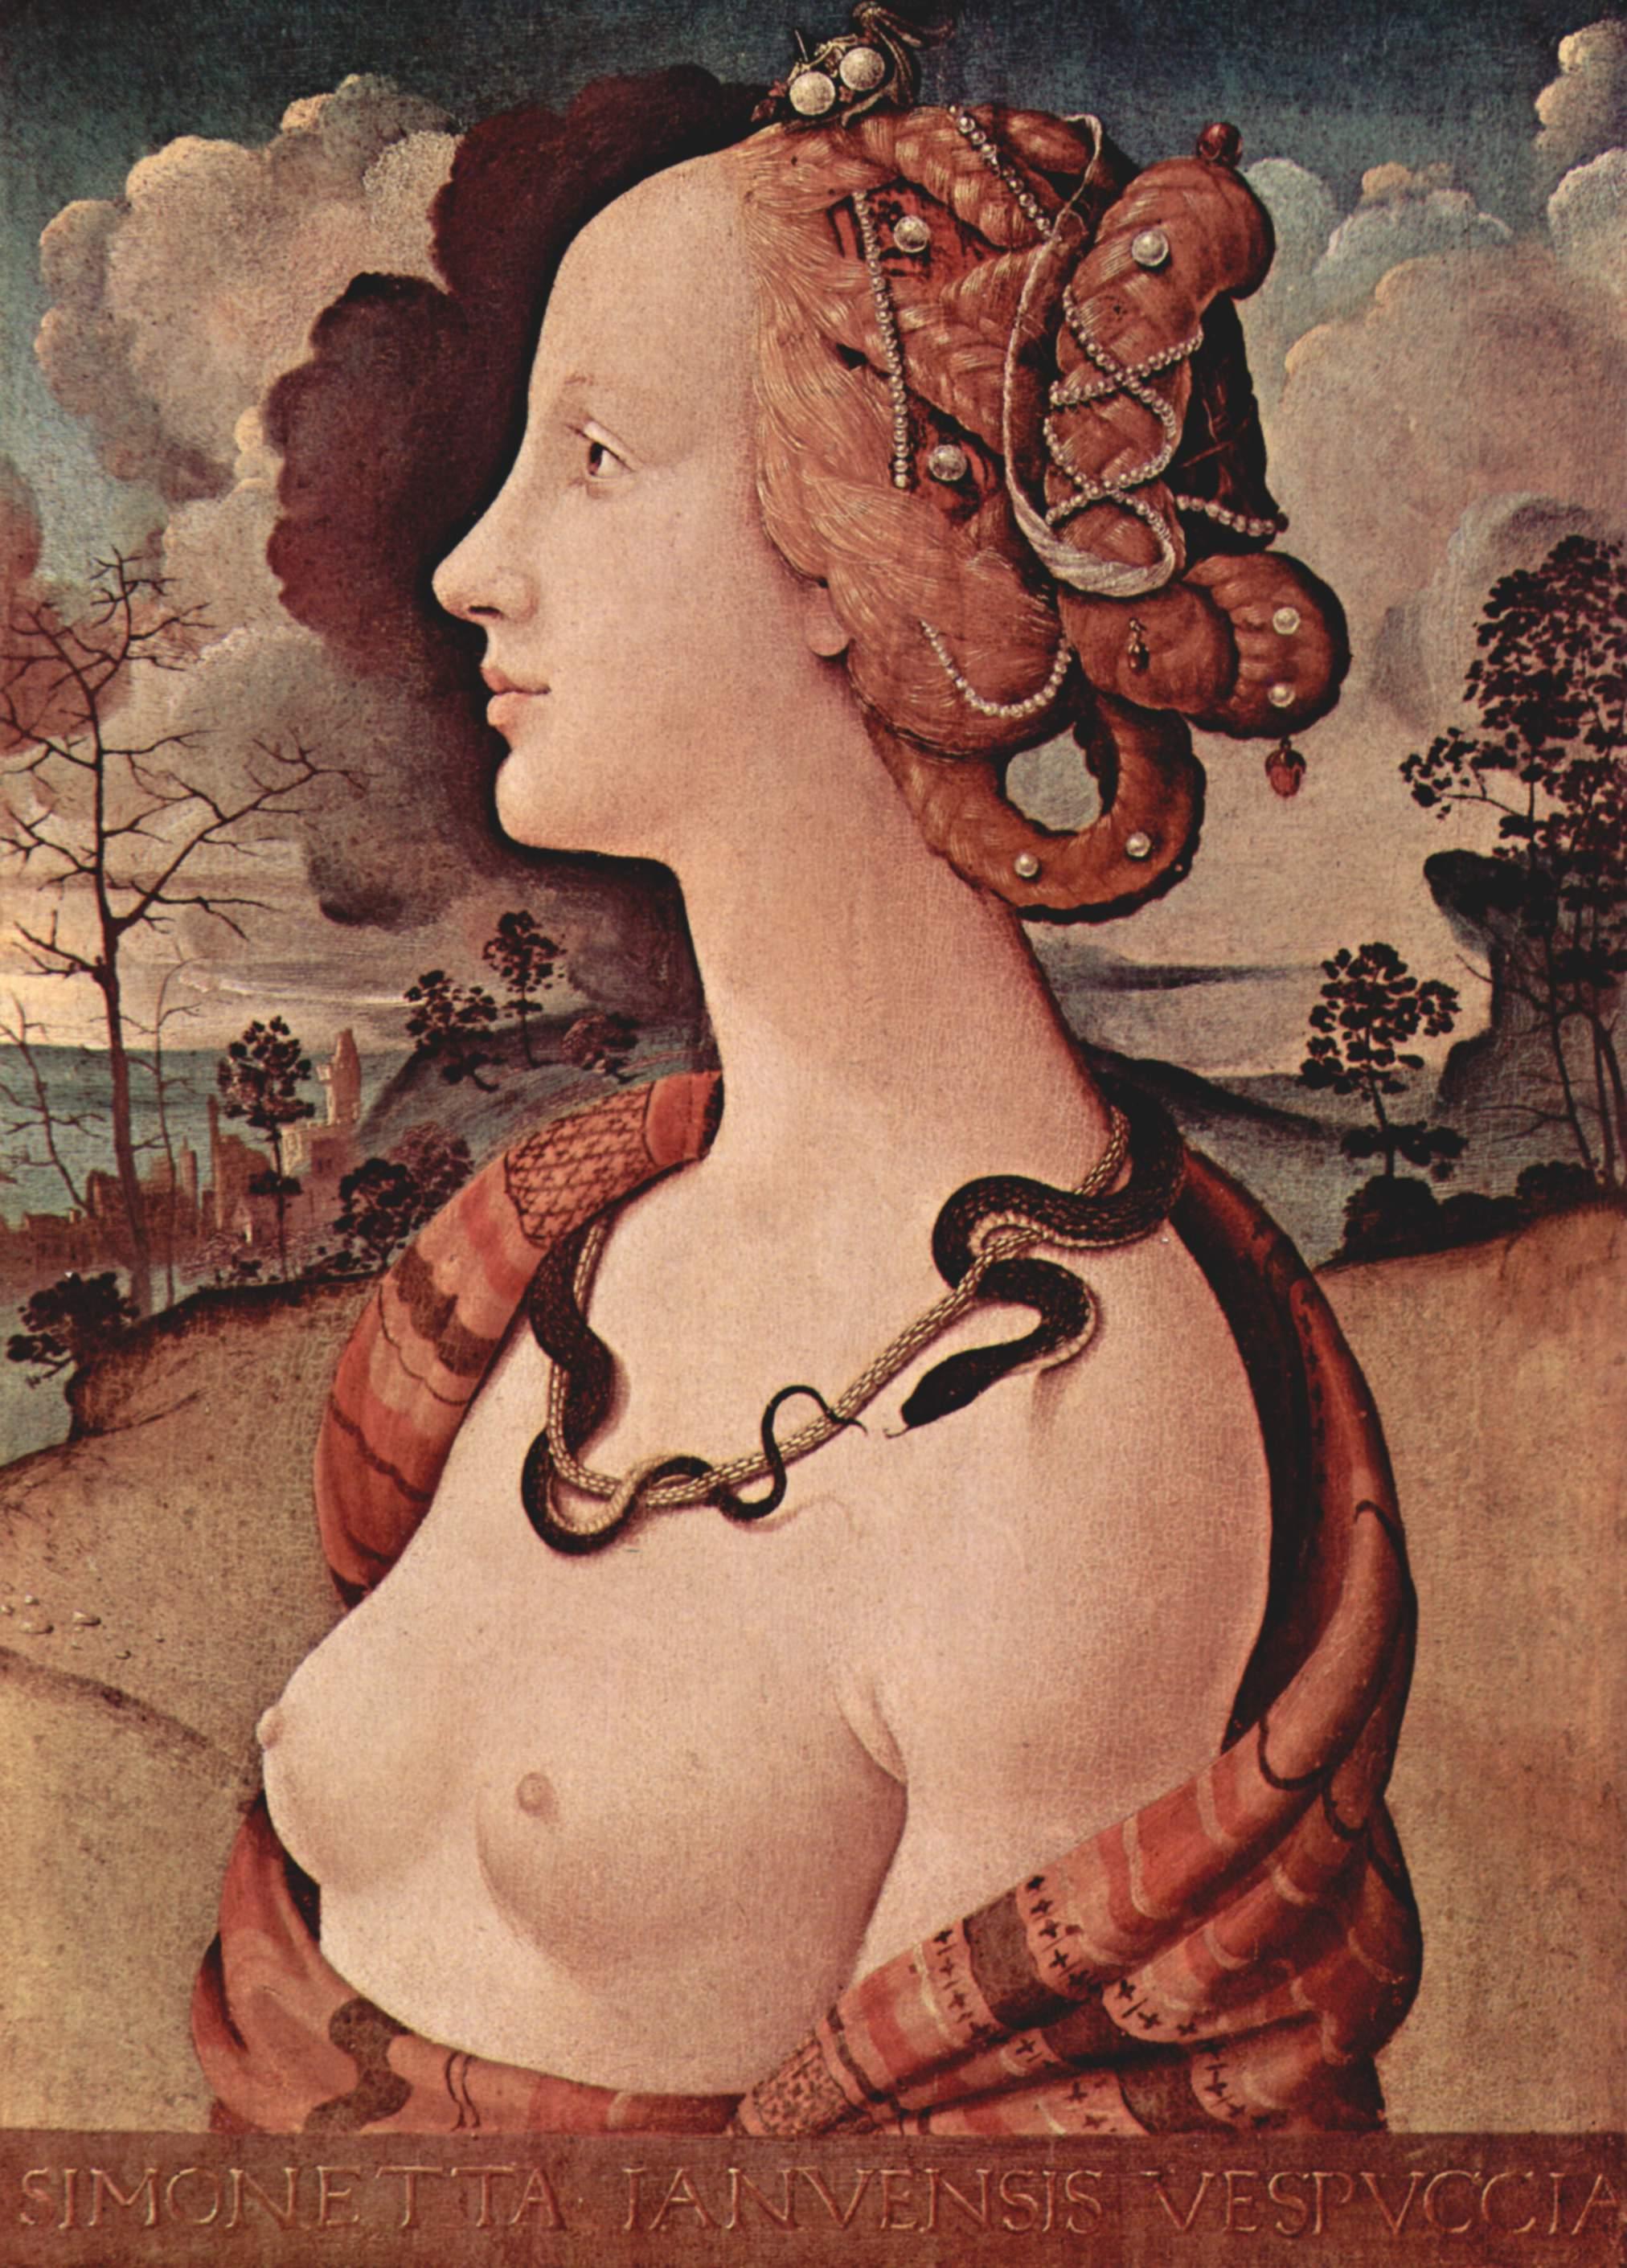 http://upload.wikimedia.org/wikipedia/commons/7/7c/Piero_di_Cosimo_043.jpg